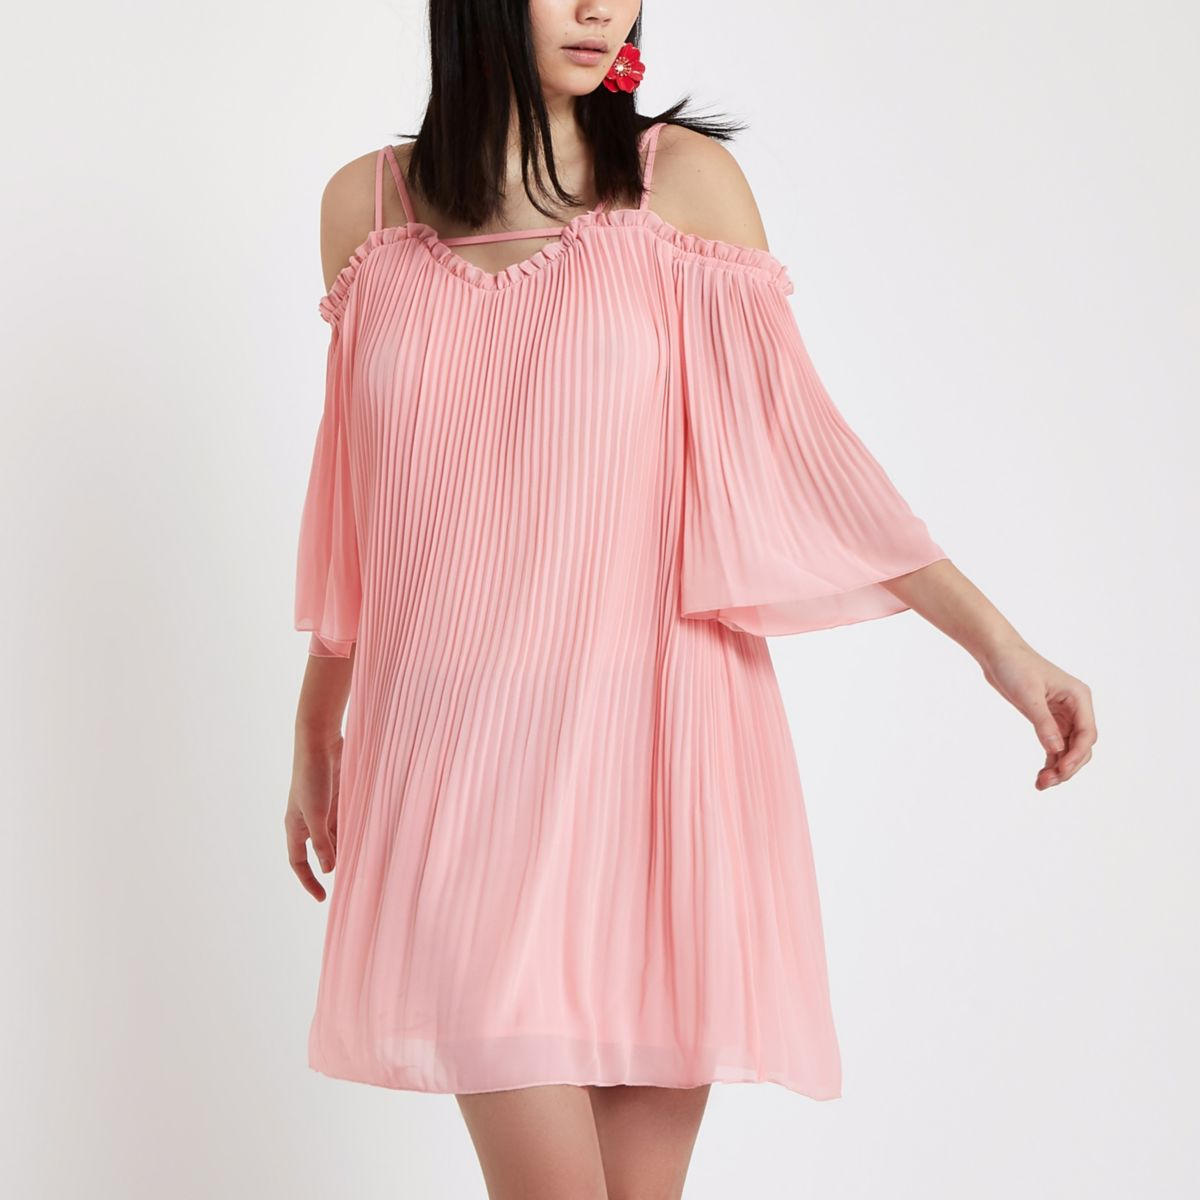 Pink chiffon cold shoulder swing dress